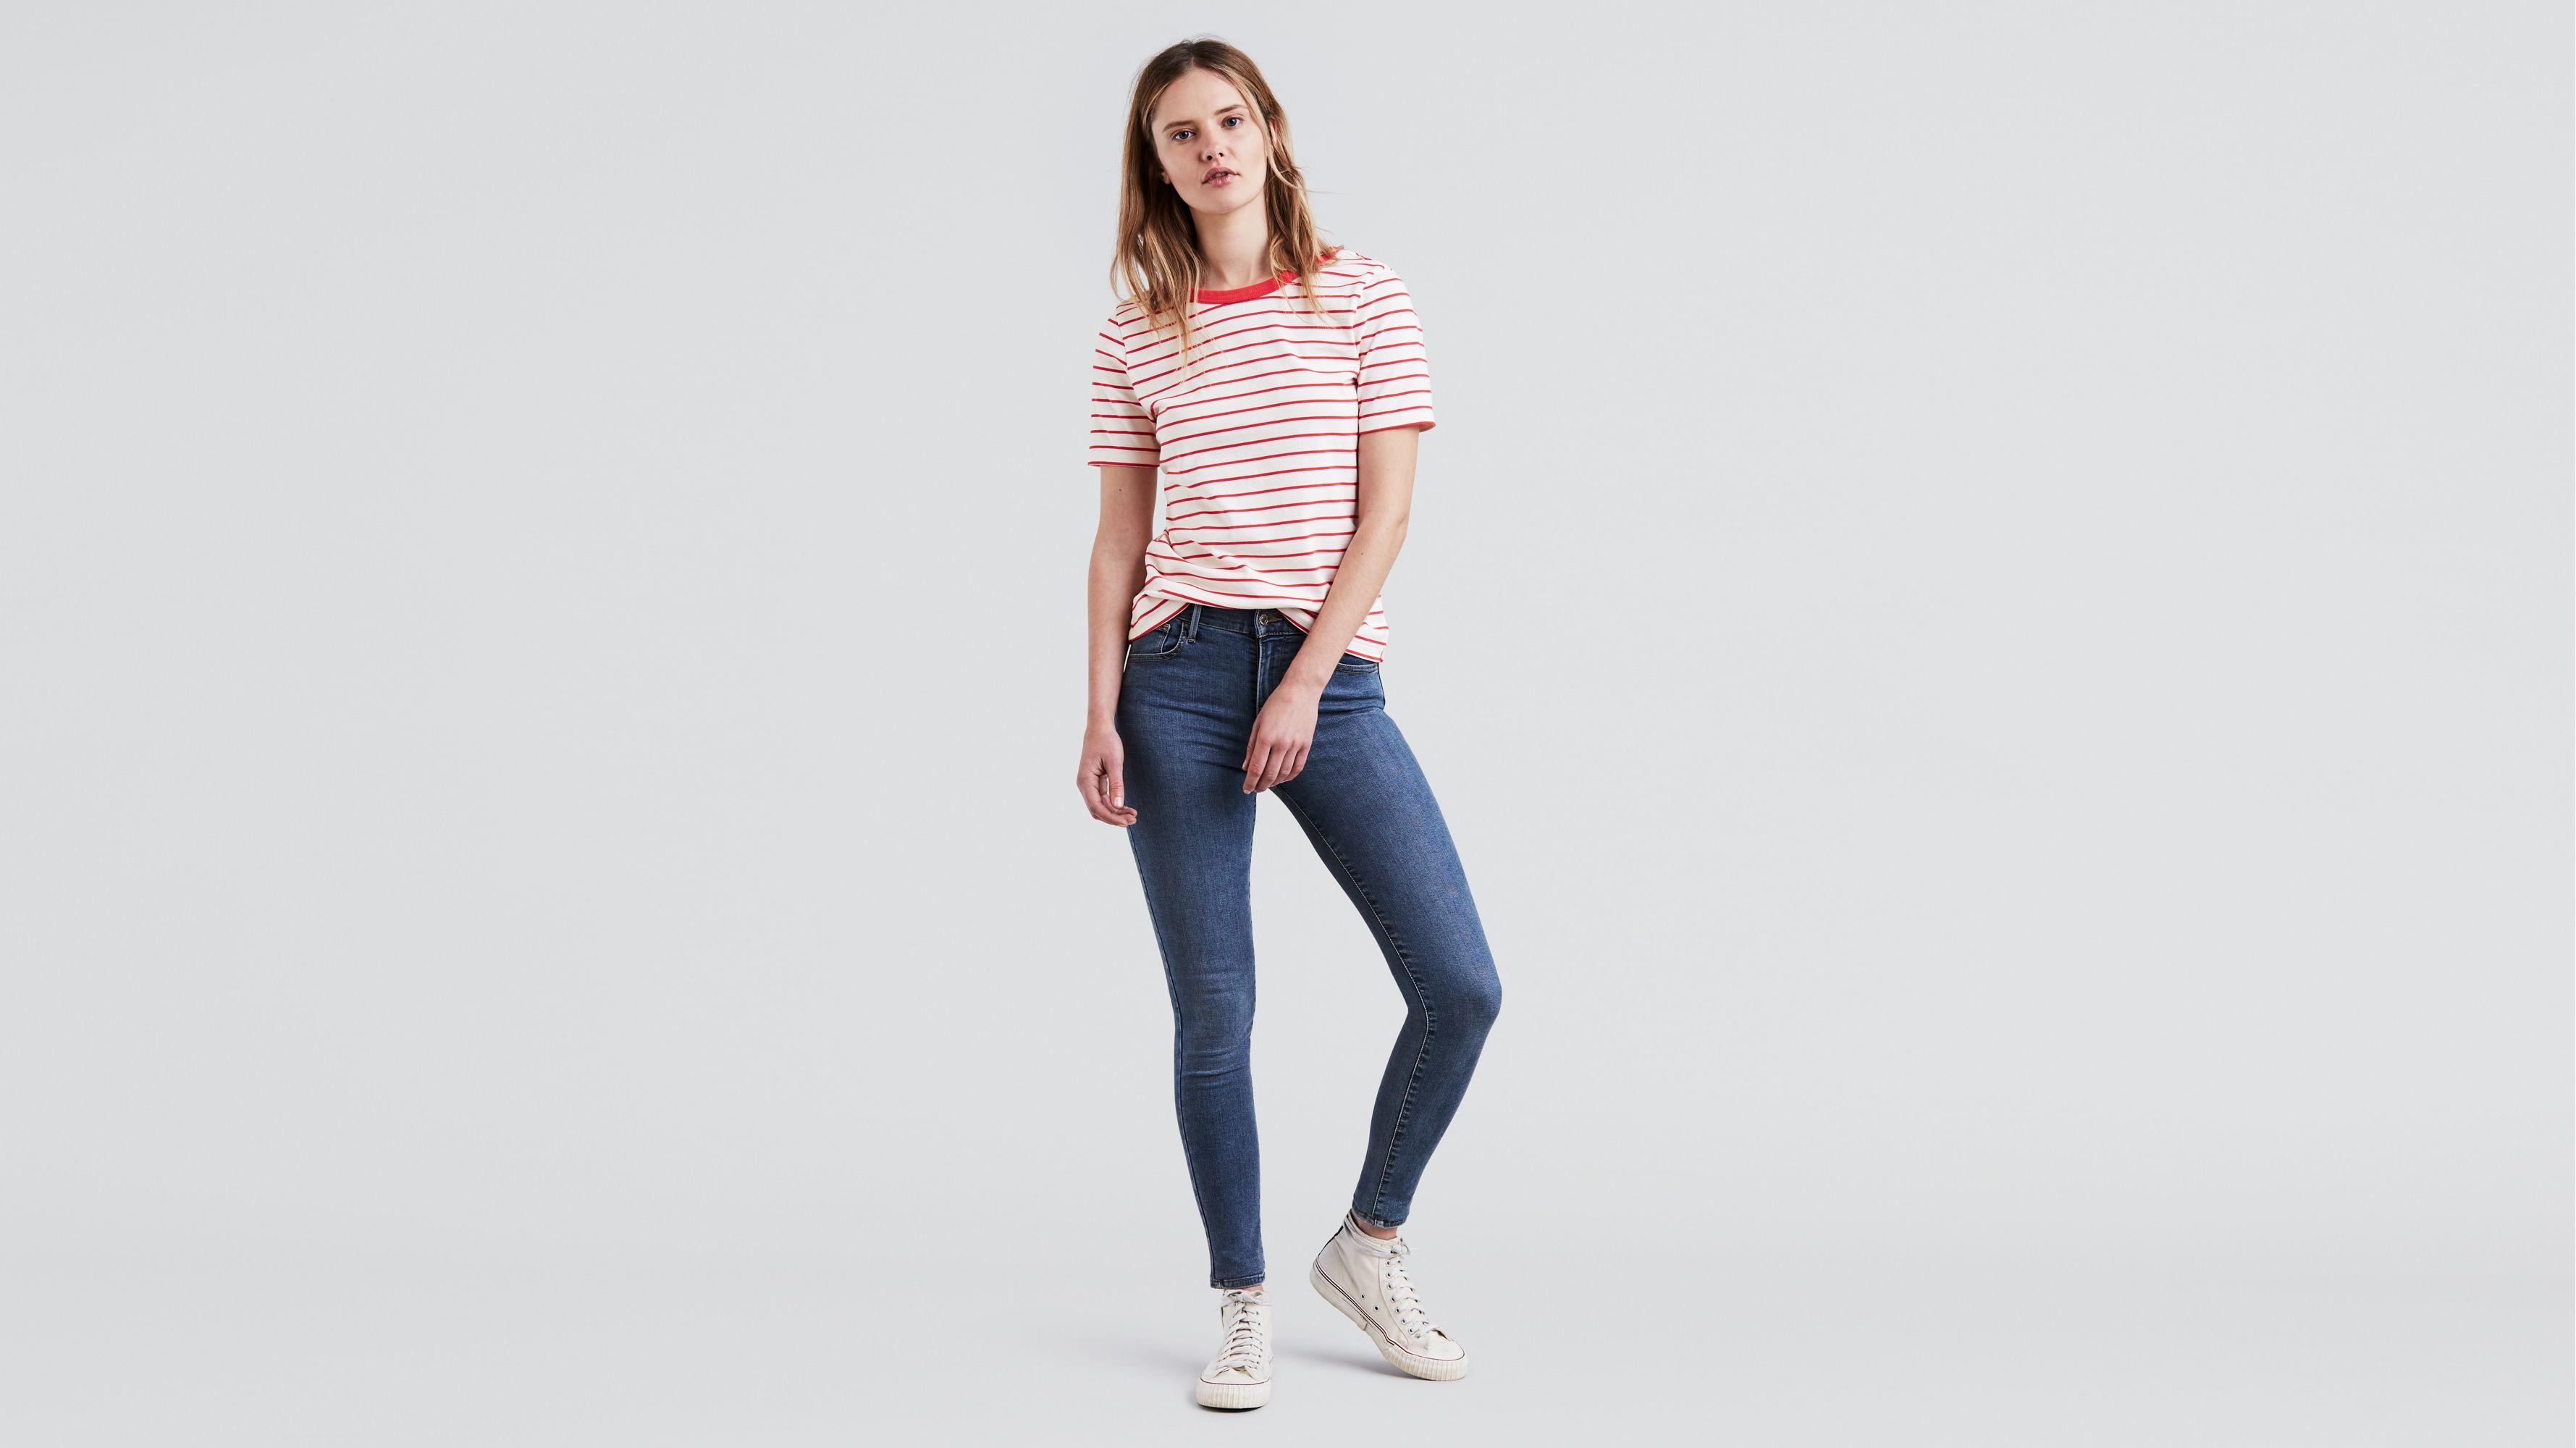 Levis High Dames Waist Jeans Sale w8ZxrwAq